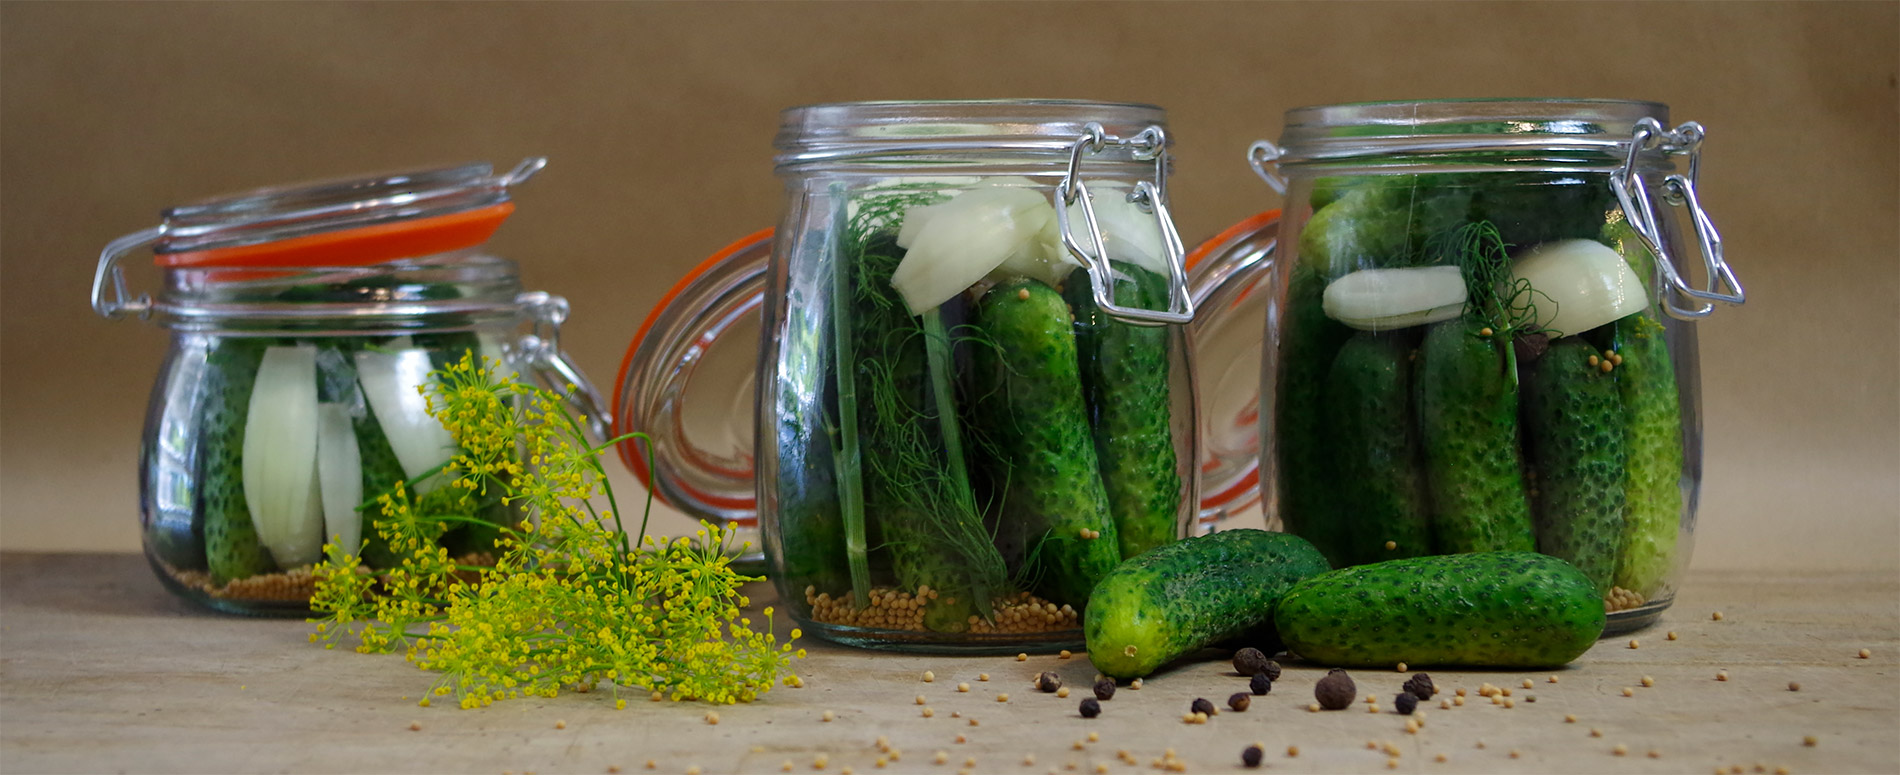 Rezept Gewürzgurken Im Glas Rezept Aus Dem Spreewald